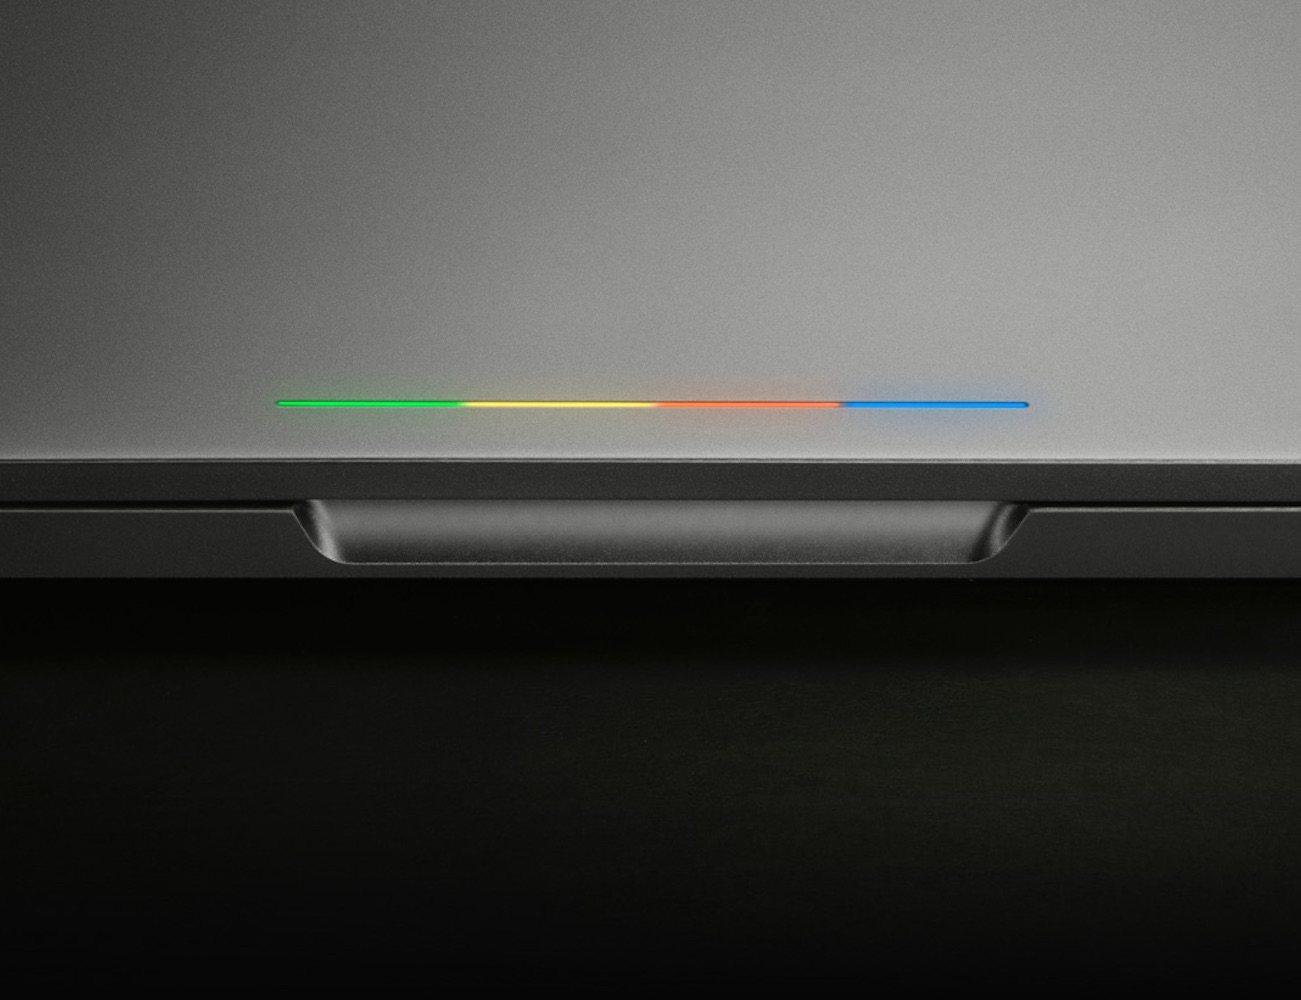 chromebook-pixel-01